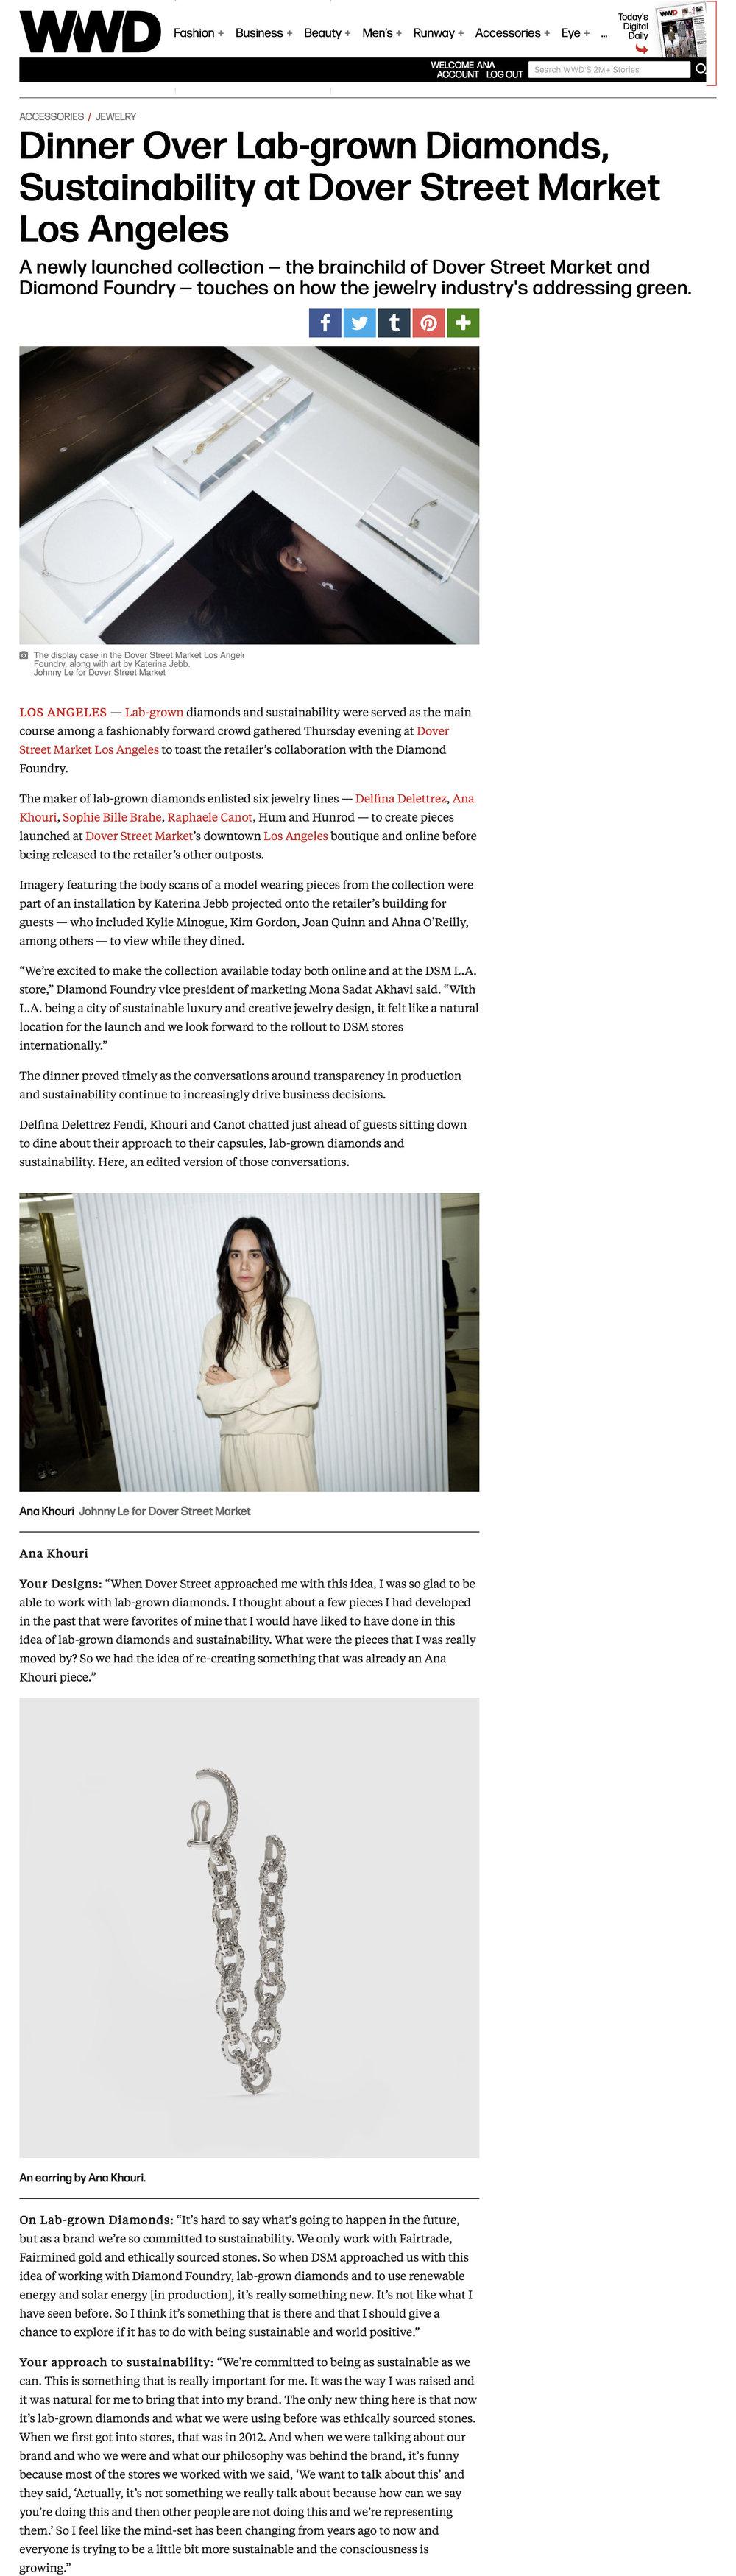 Women's Wear Daily Online May 1, 2019 Diamond Foundry.jpg